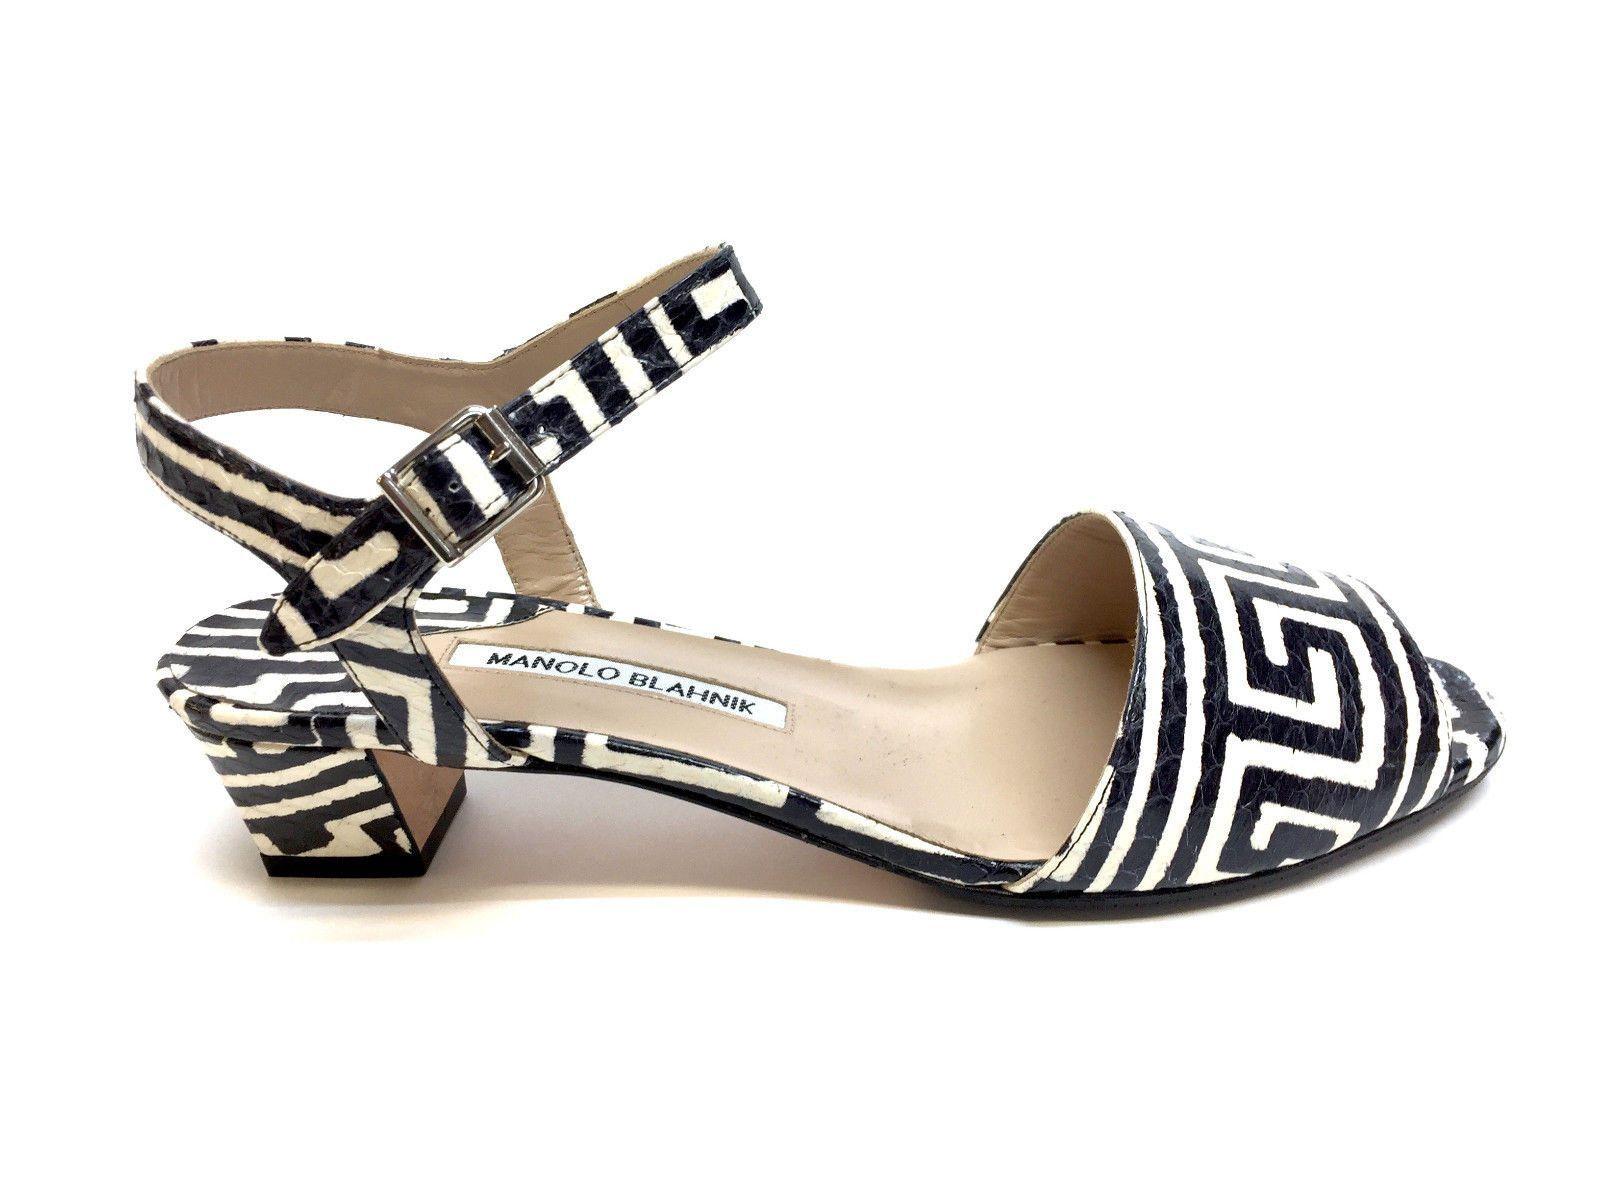 67e0acff2627c MANOLO BLAHNIK Black   Ivory Greek-Key Patterned Python Skin Ankle-Strap  Sandals Size  39   9  manoloblahniksandals